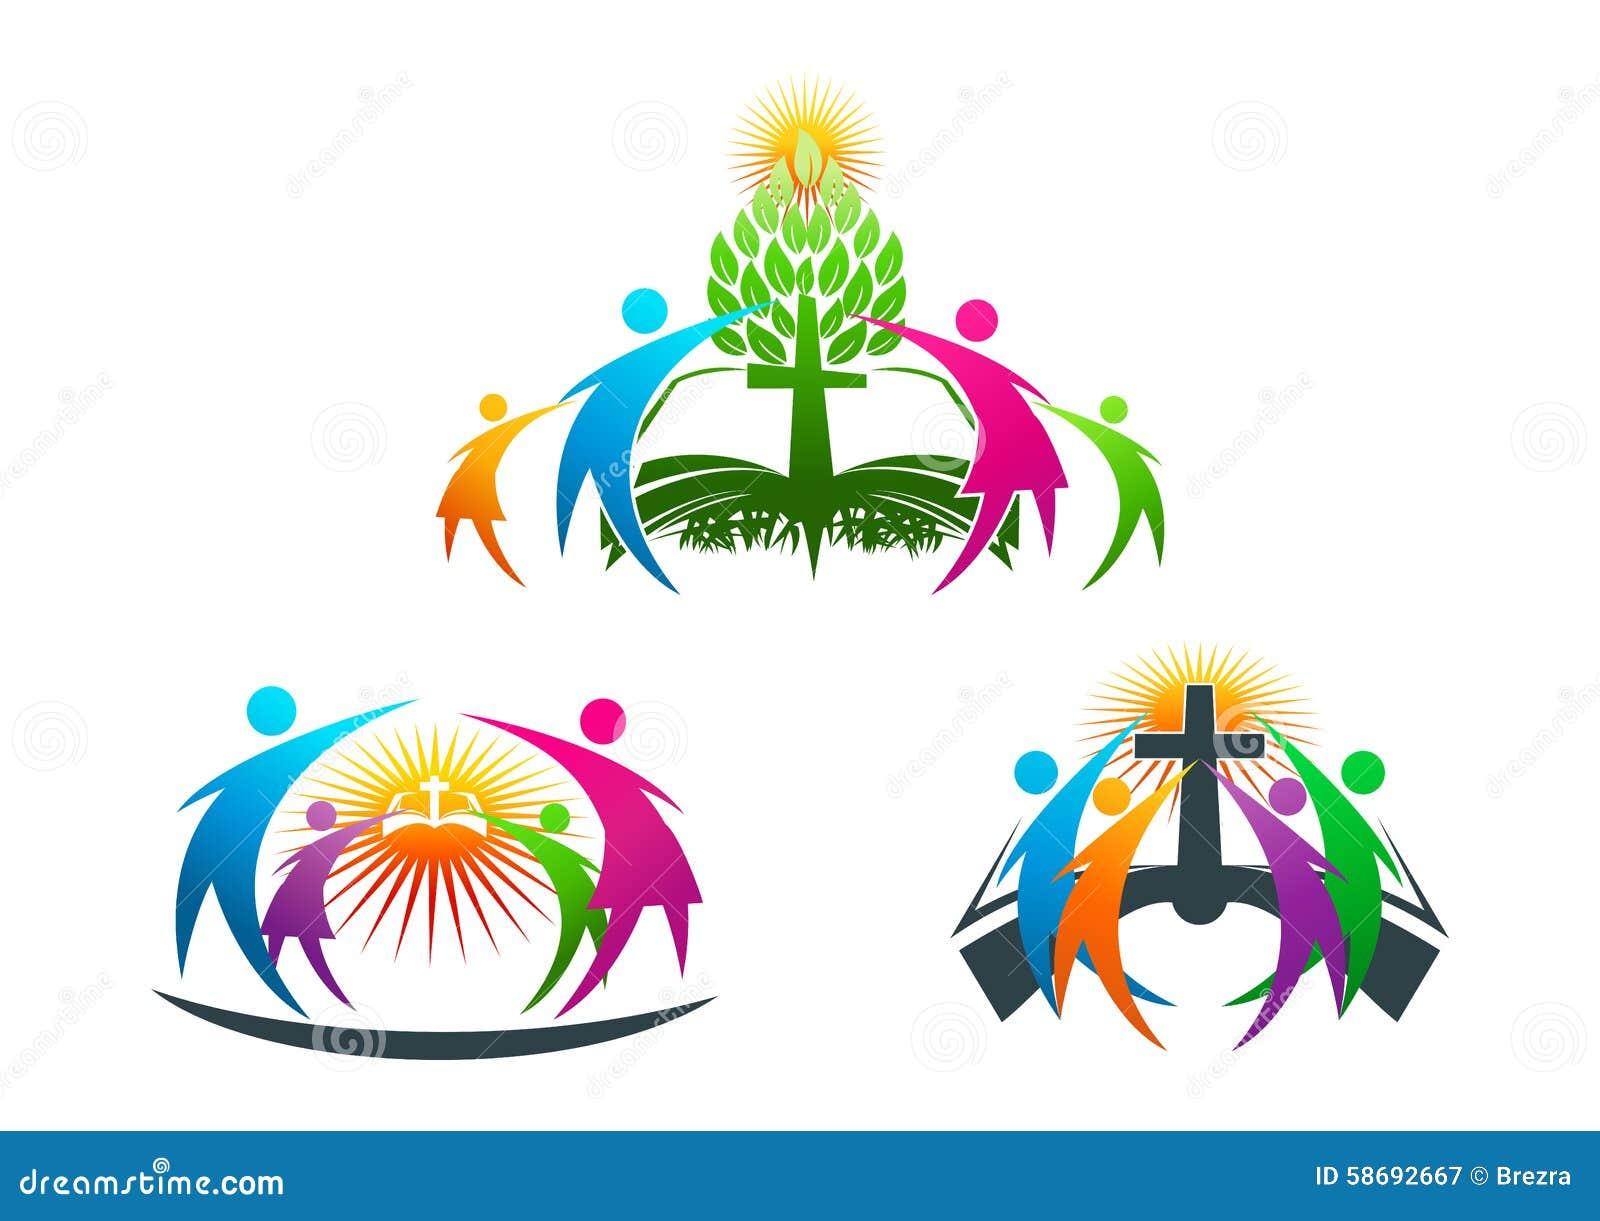 Biblia, gente, árbol, raíz, cristiano, logotipo, familia, libro, iglesia, vector, símbolo, diseño